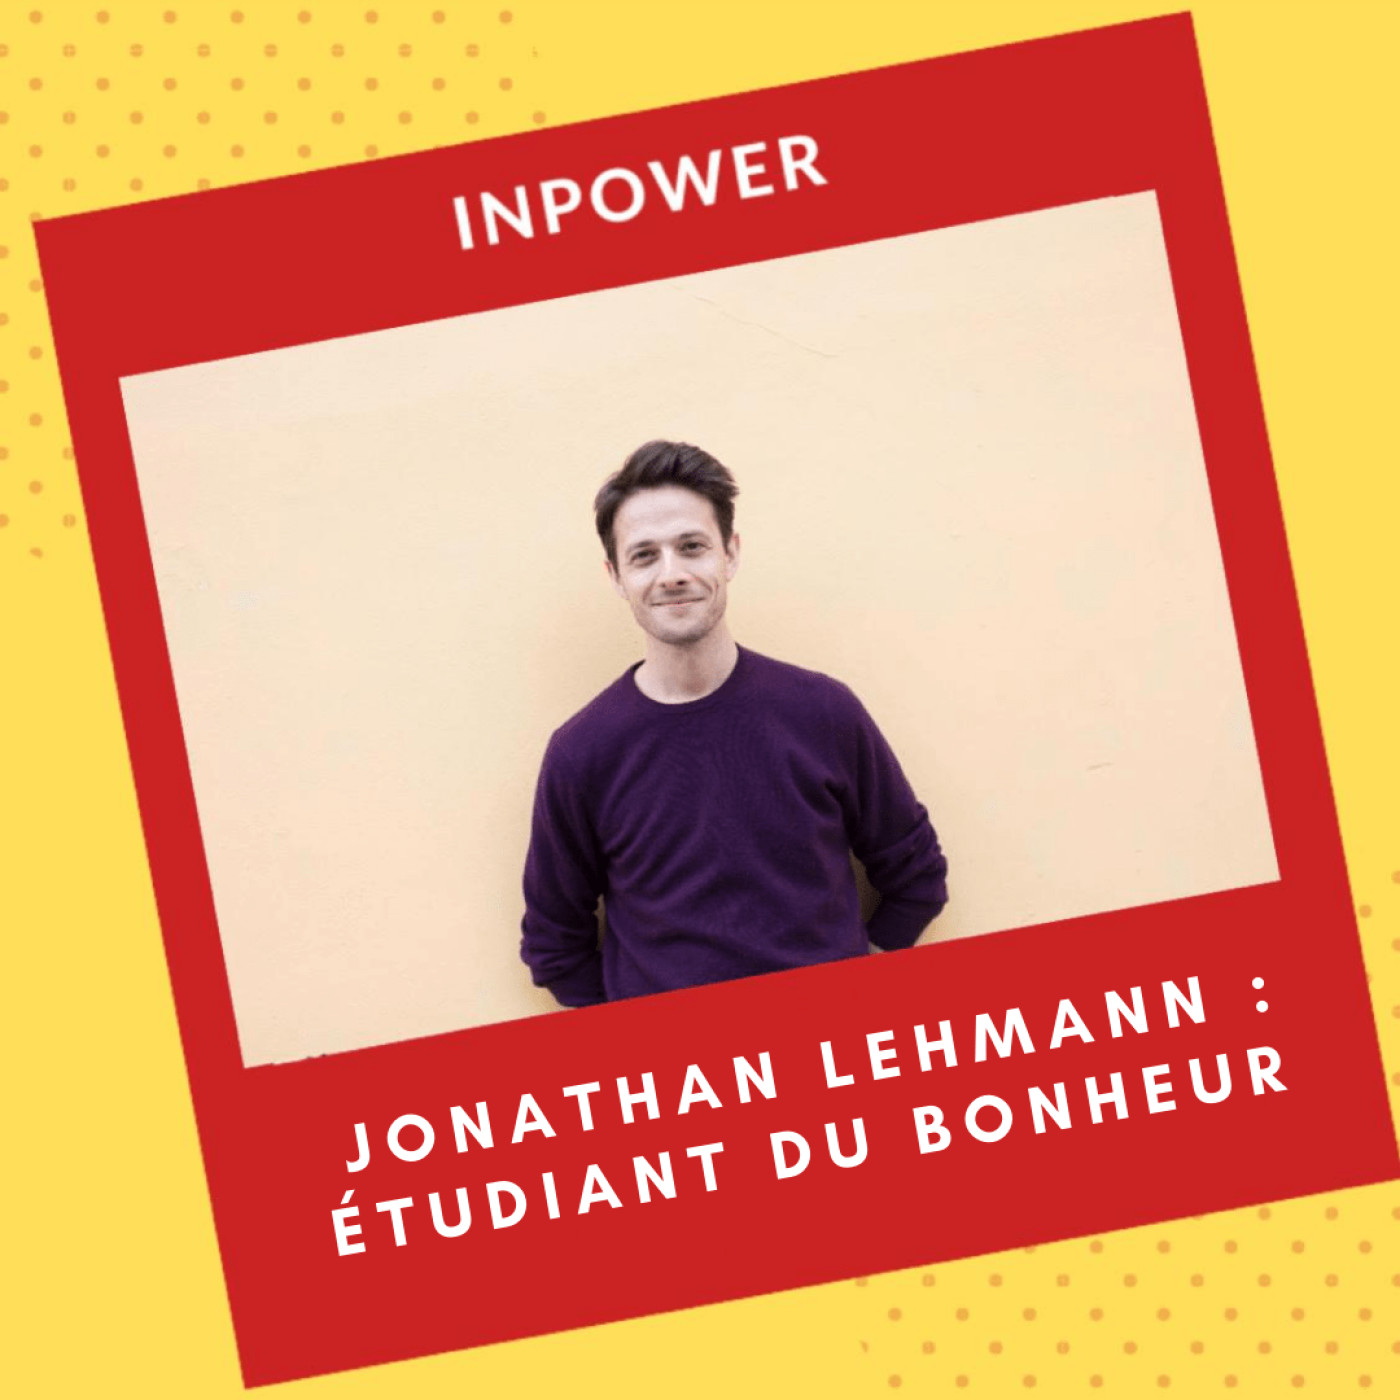 Jonathan Lehmann - Etudiant du bonheur